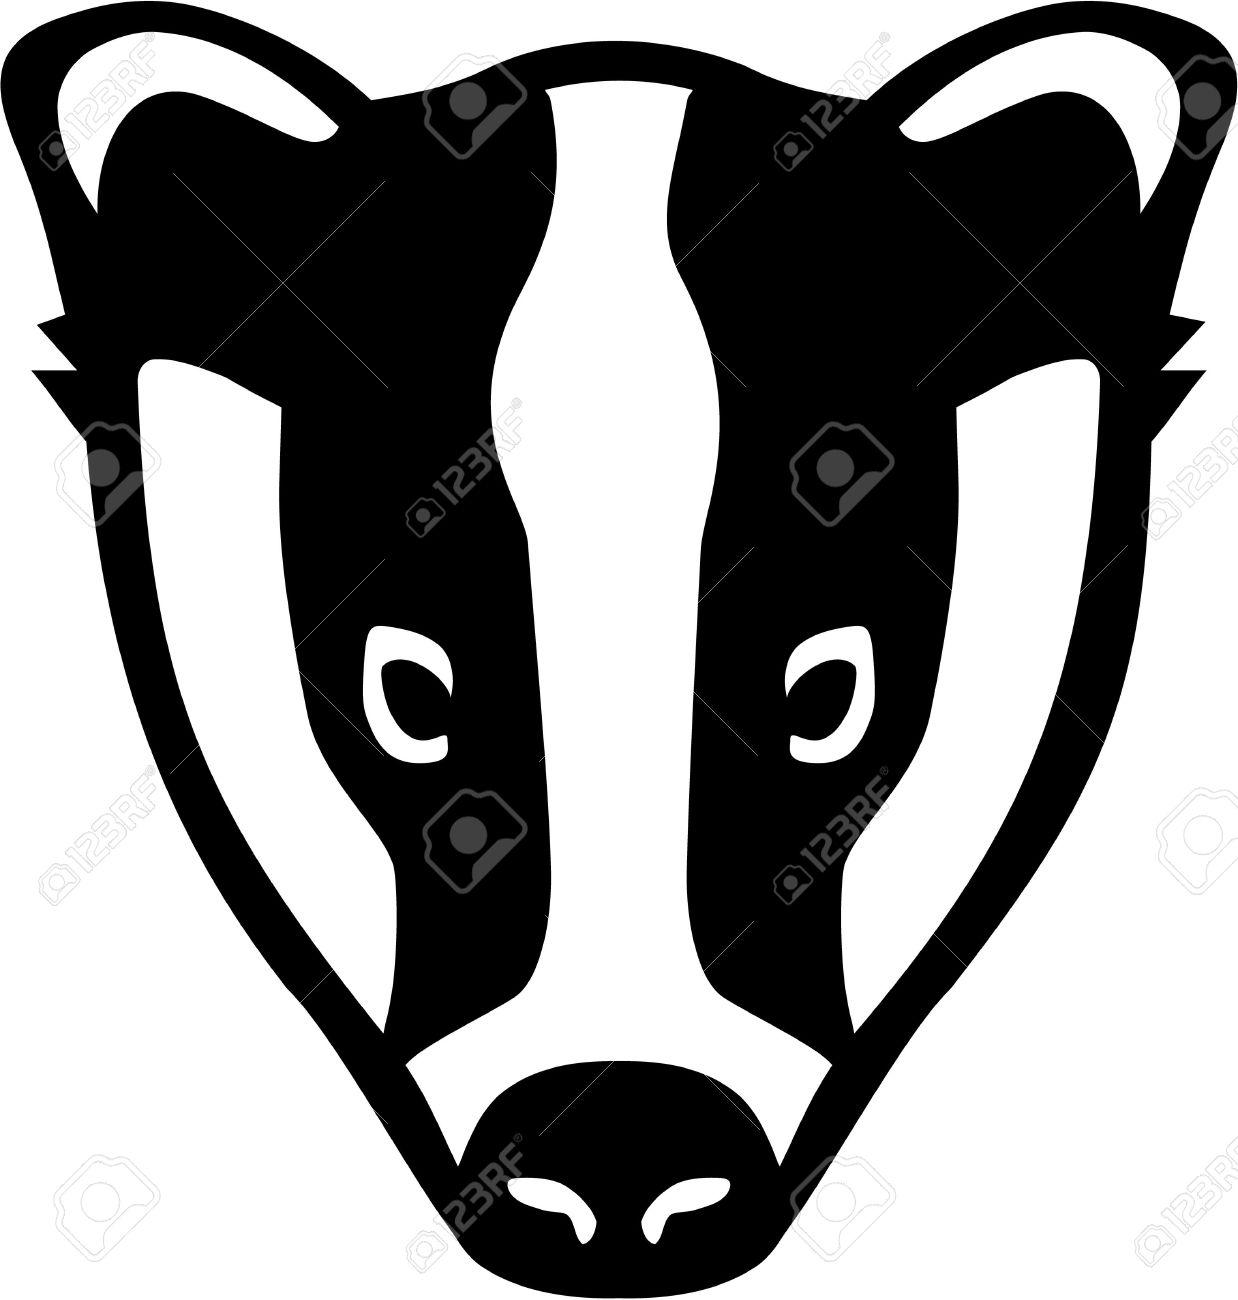 Badger clipart Clipart #4 badger art Clipart